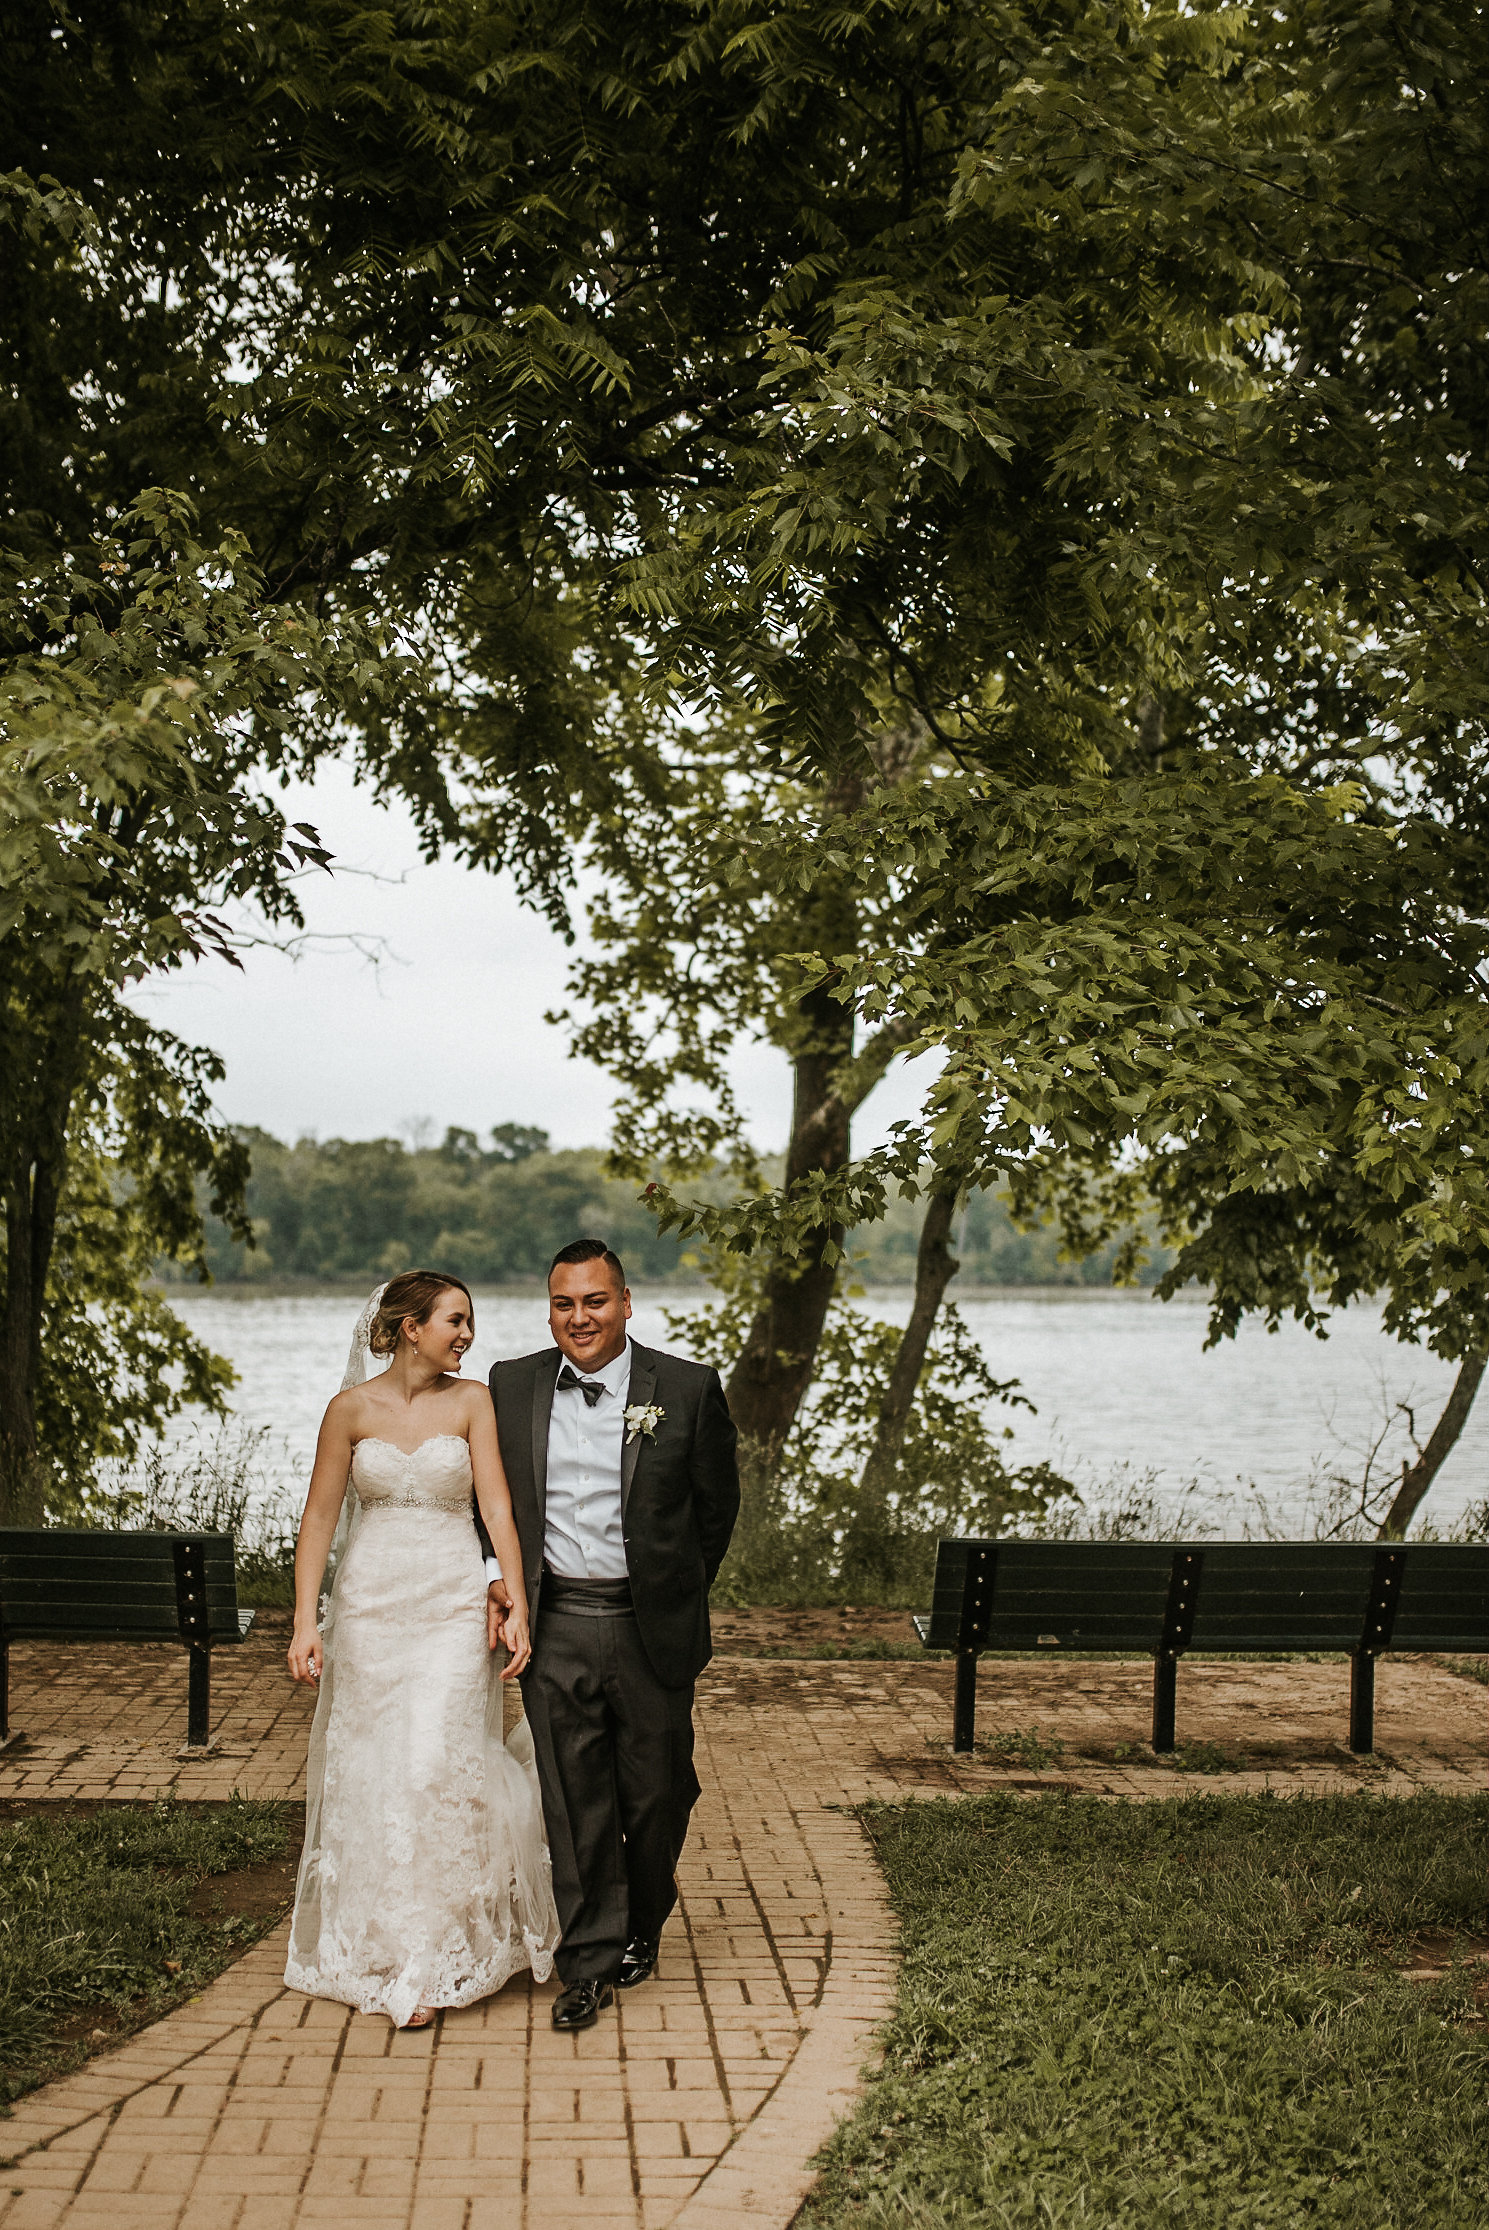 Bride and groom walking away from lake